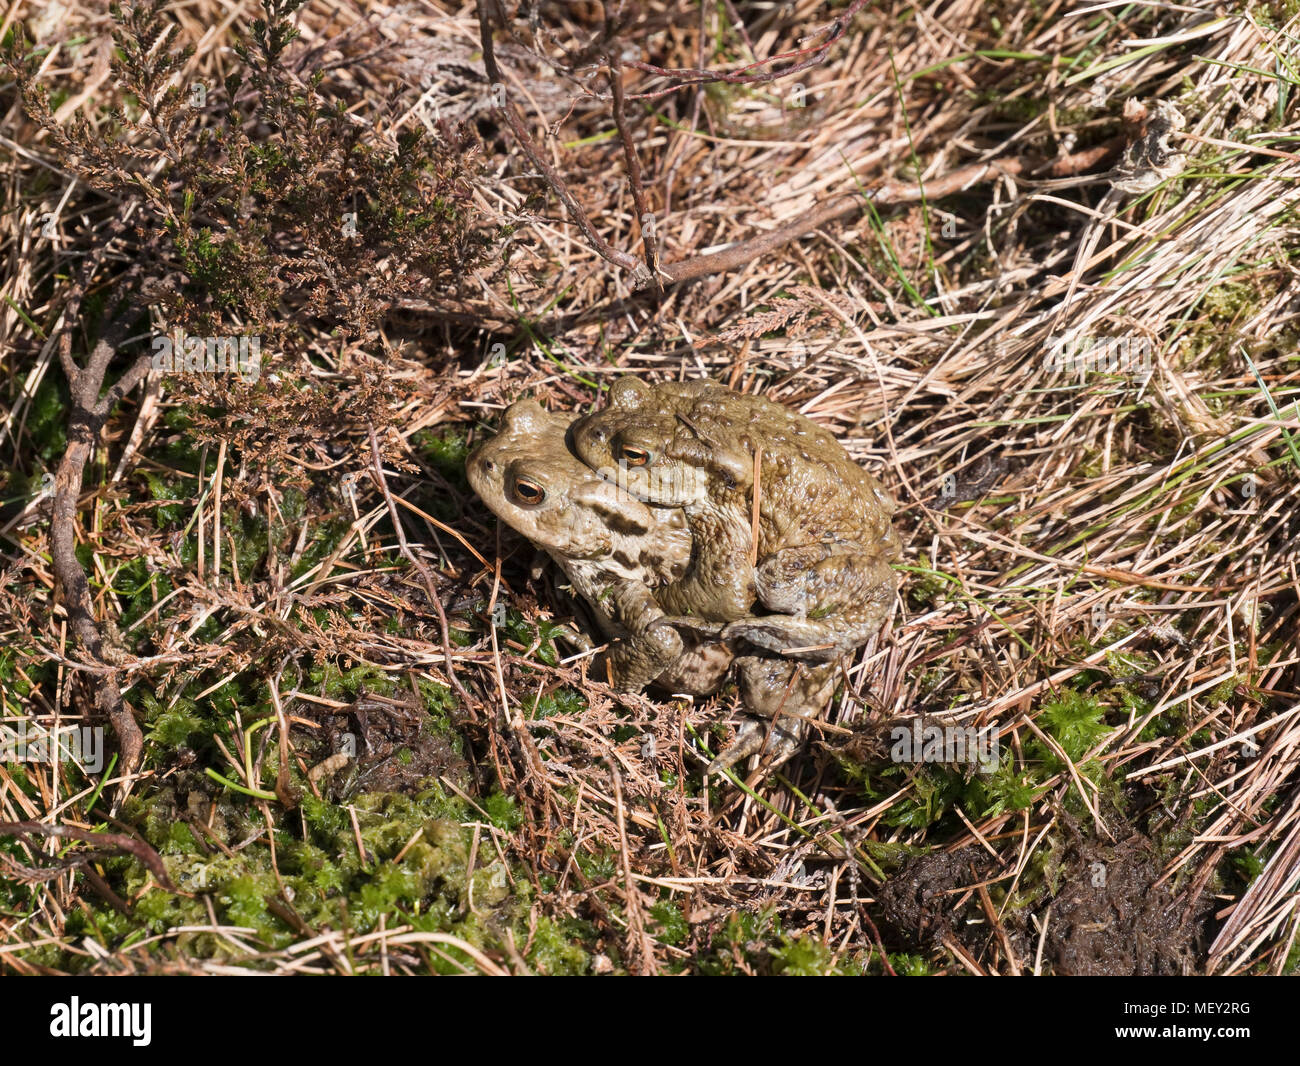 Common toads (Bufo bufo) in amplexus, spotted on Cadair Berwyn in the Welsh Berwyn mountains - Stock Image